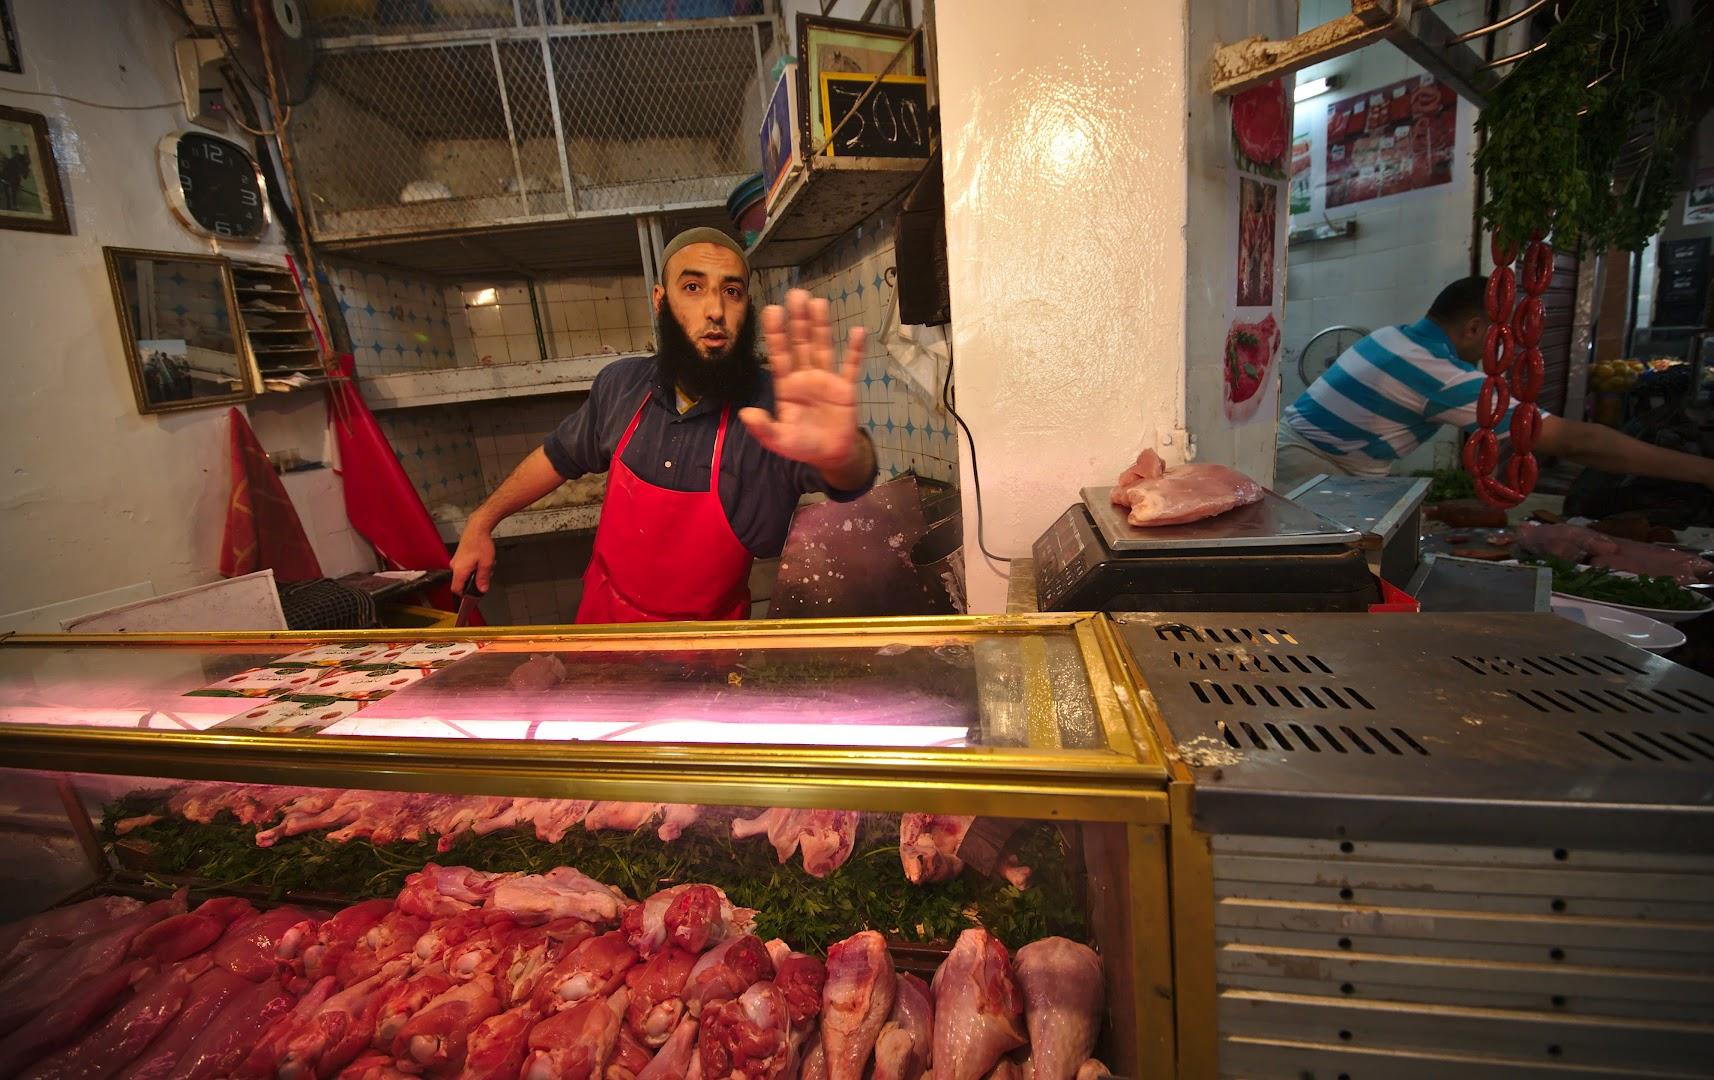 Bazaar merchants don't like to be photographed